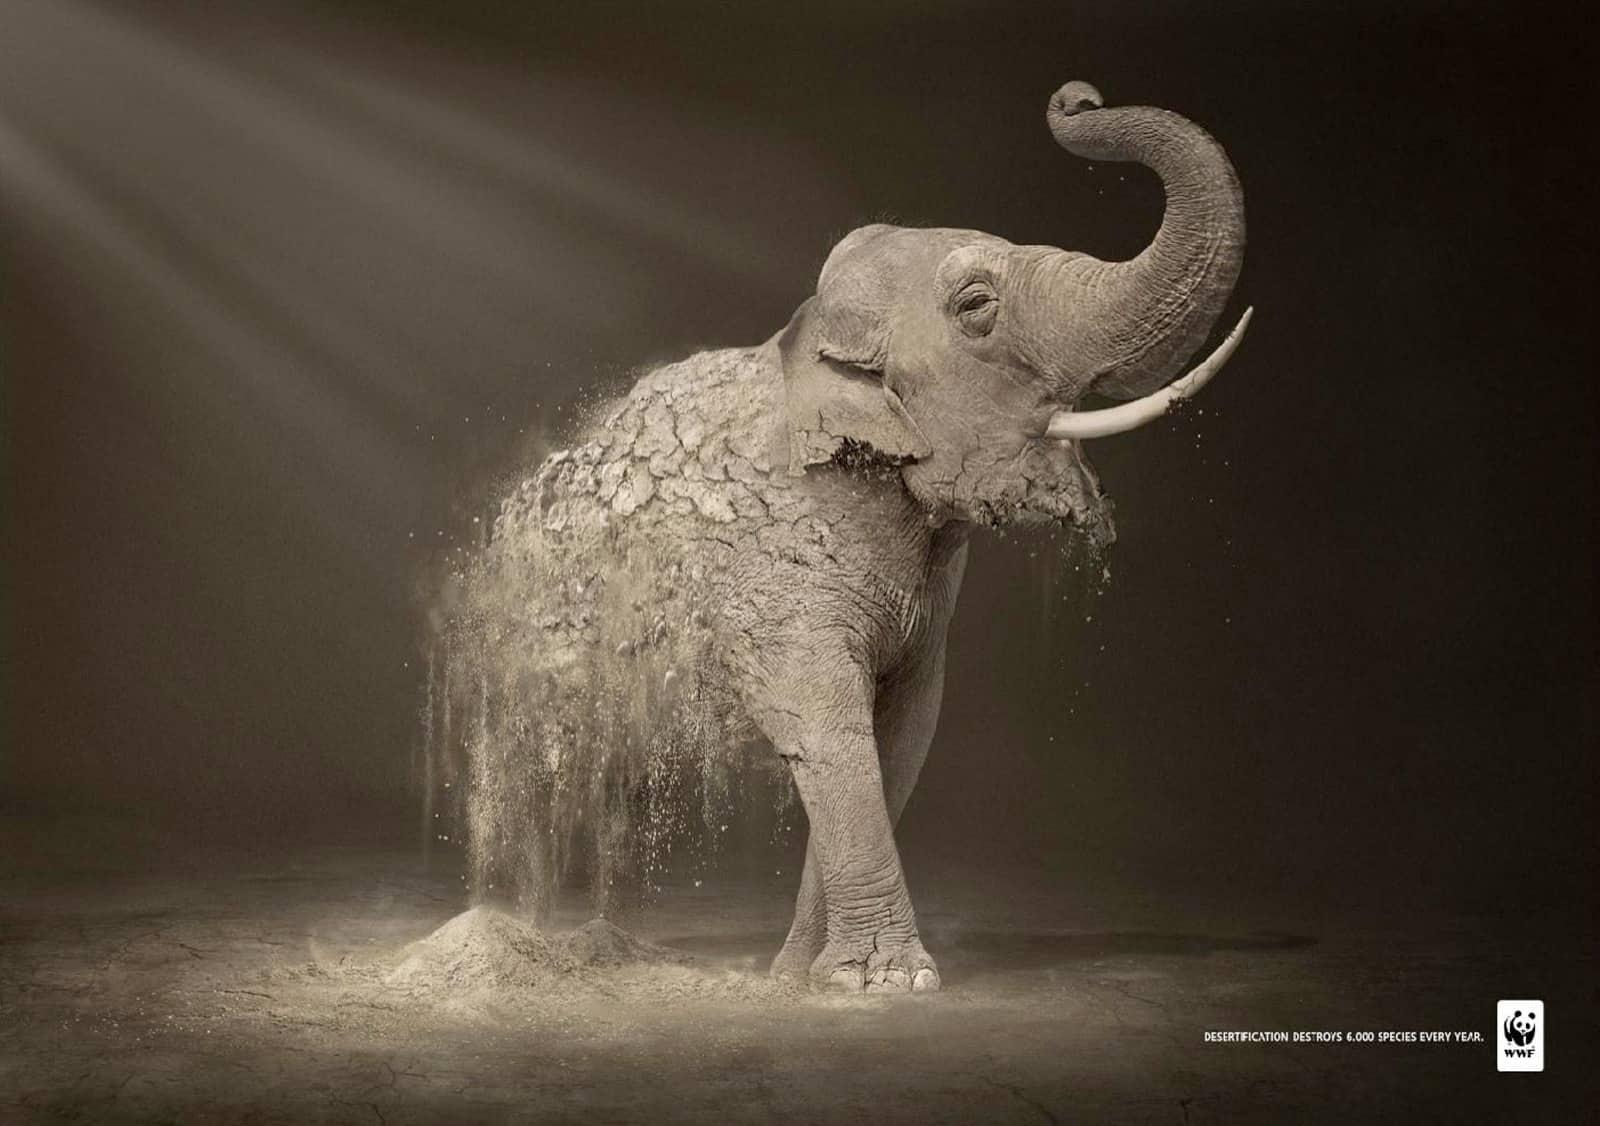 Pub WWF désertification : élephant